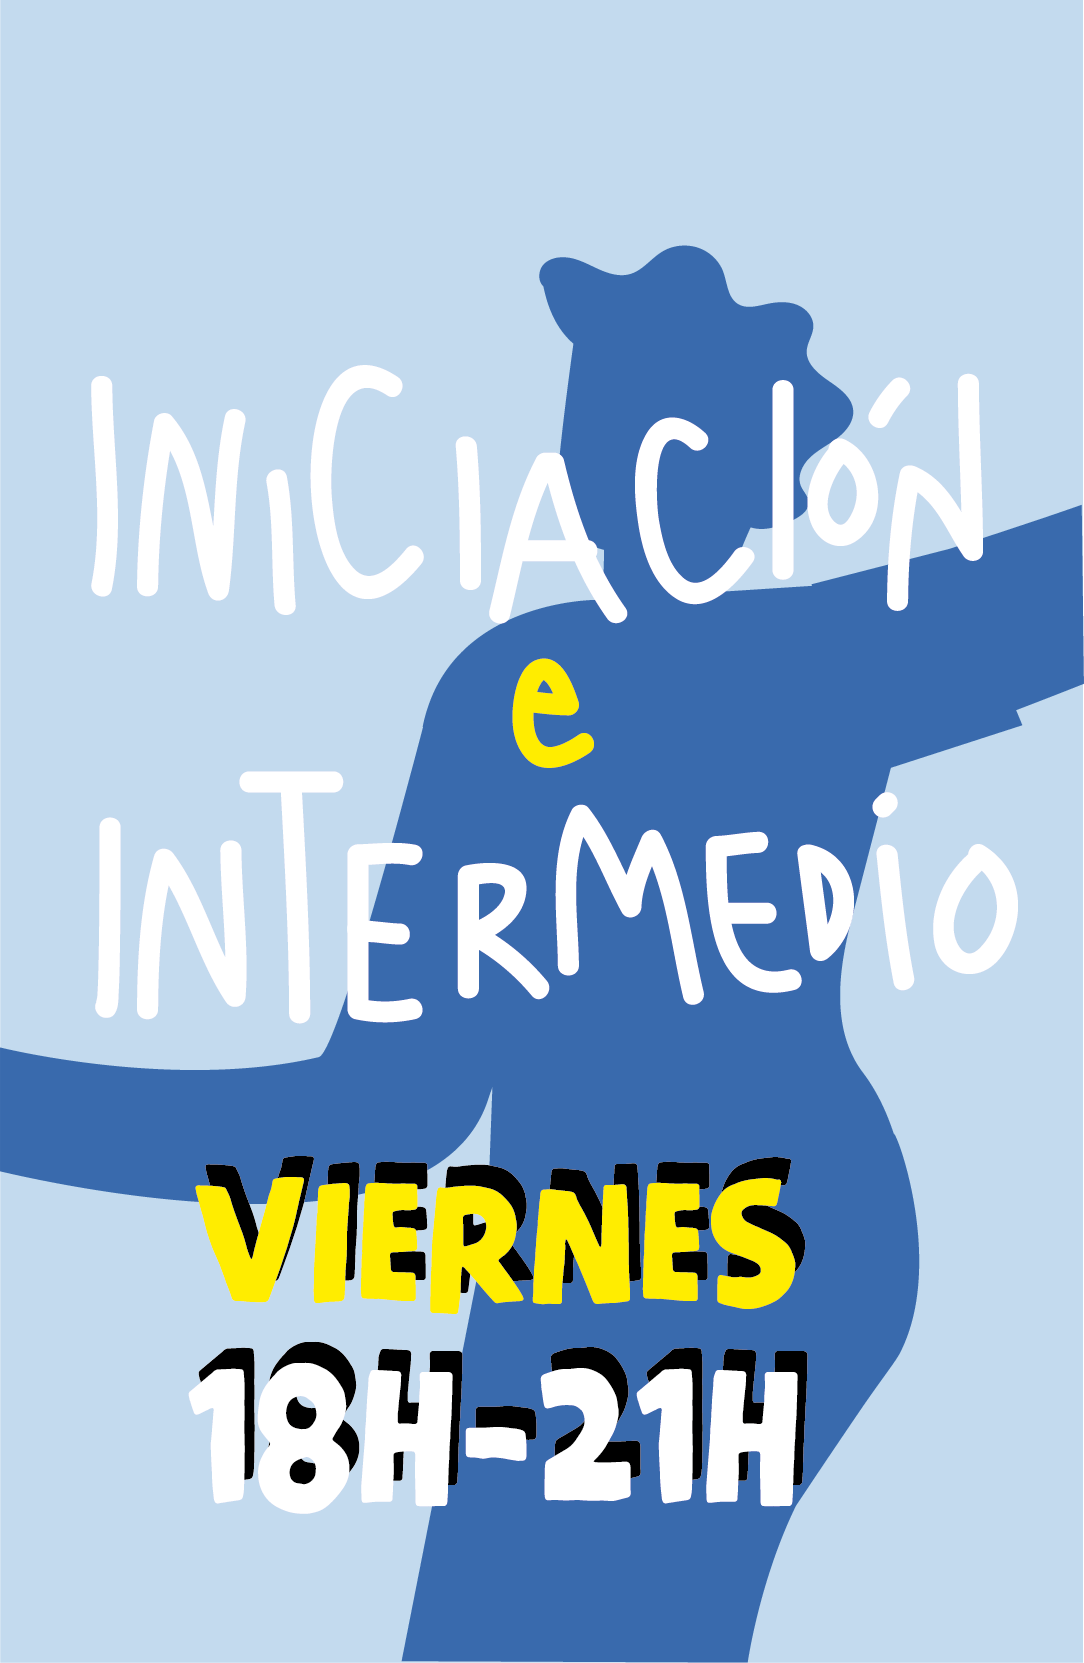 Cuadro_viernes_01.png